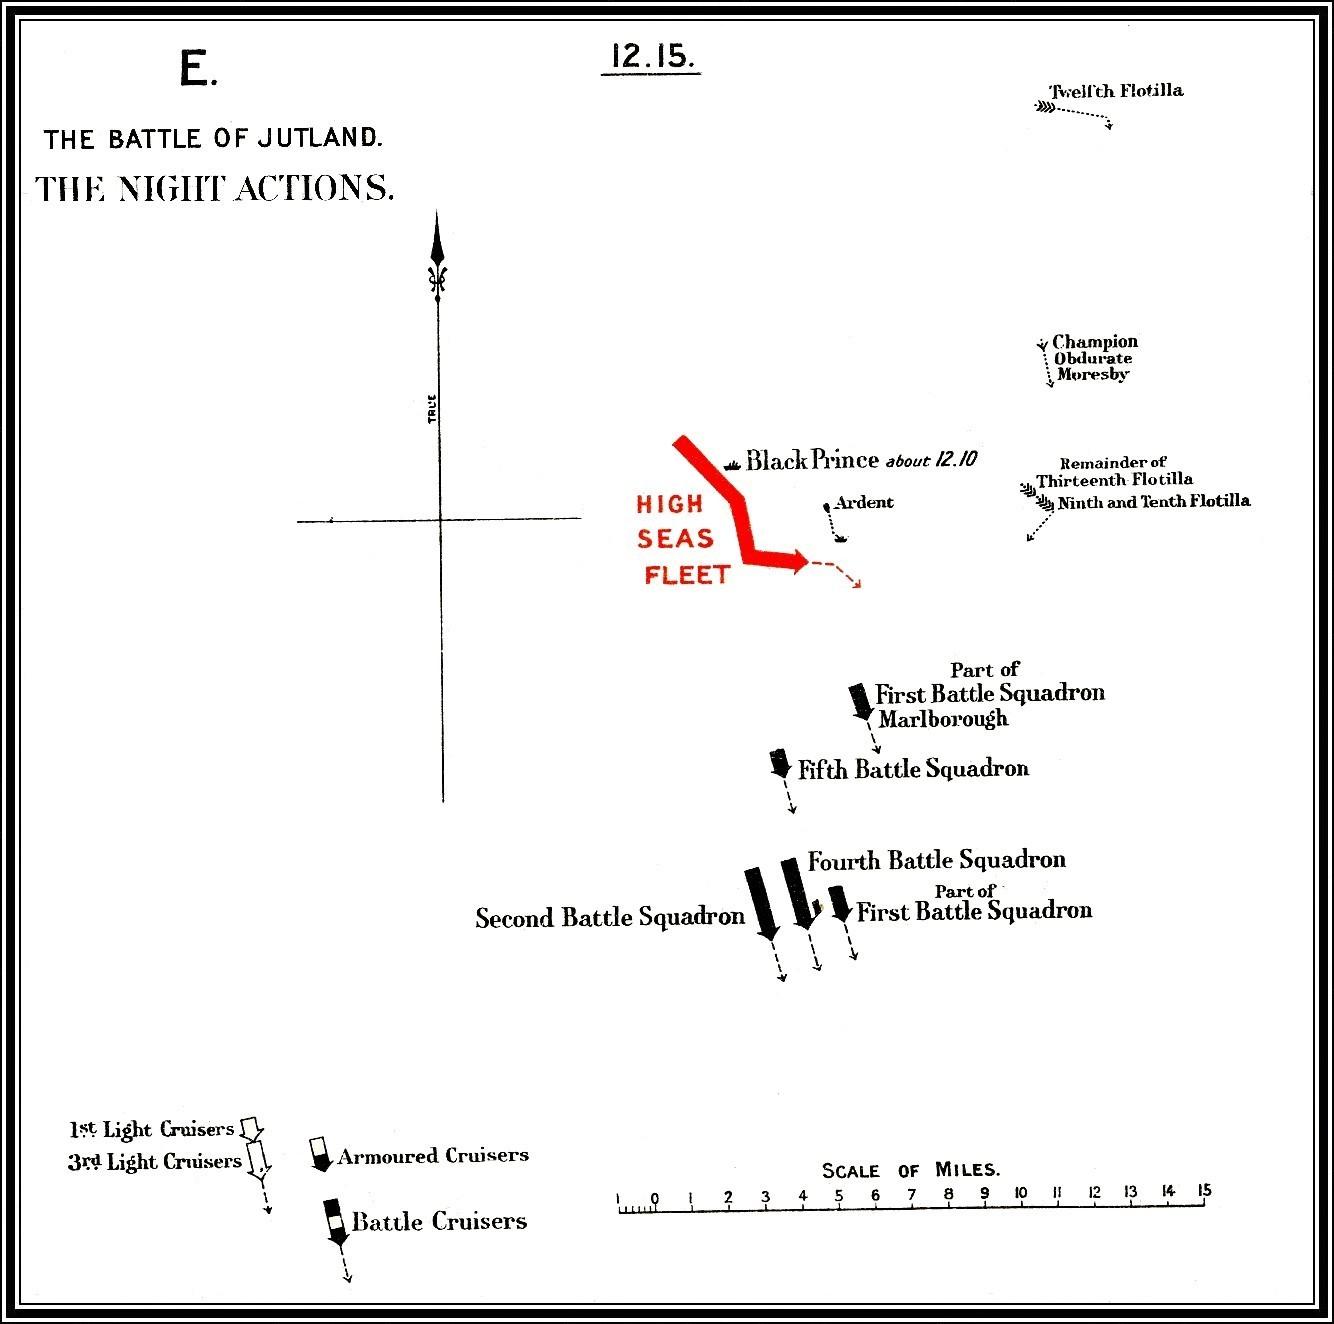 Royal navy naval operations volume 3 by sir julian corbett diagram 45 e 1215 pm nvjuhfo Choice Image